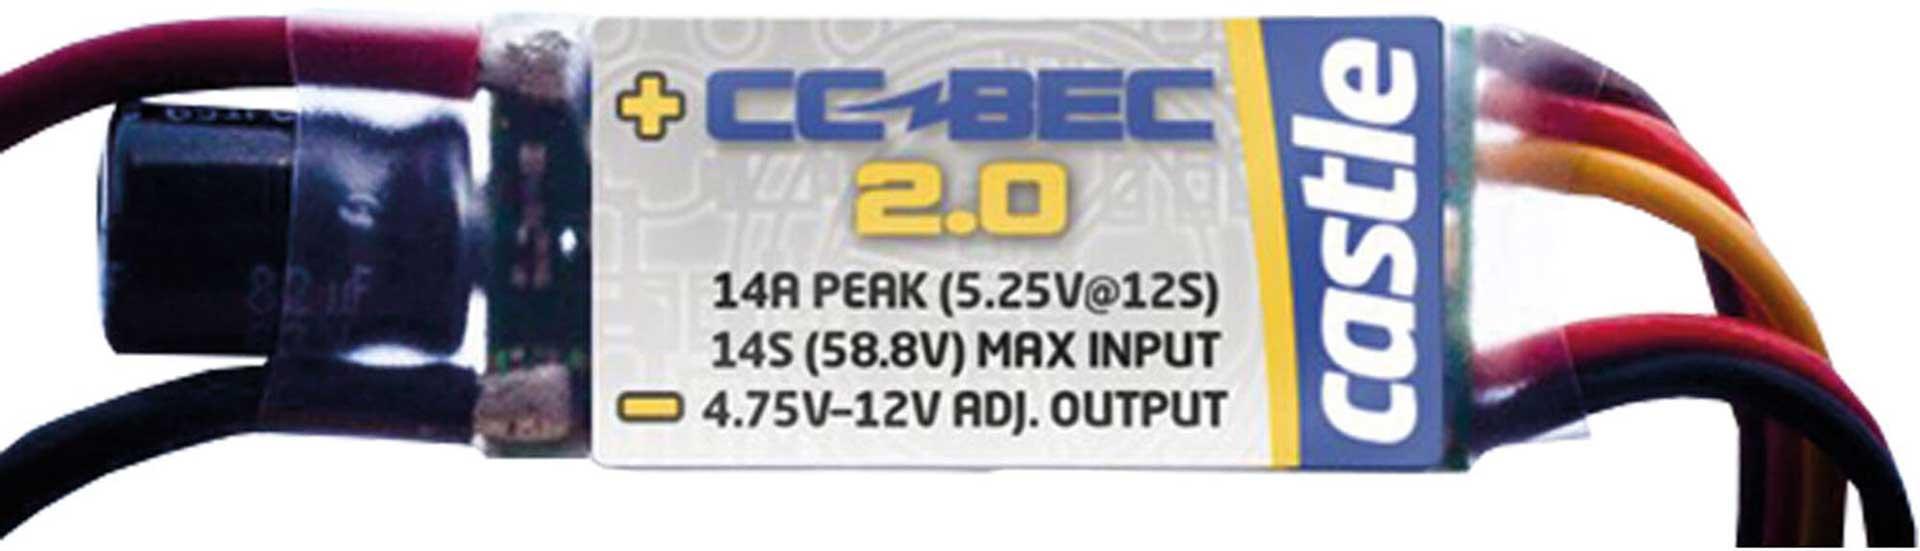 CASTLE CREATION CC BEC 2 -20A 58V -14S